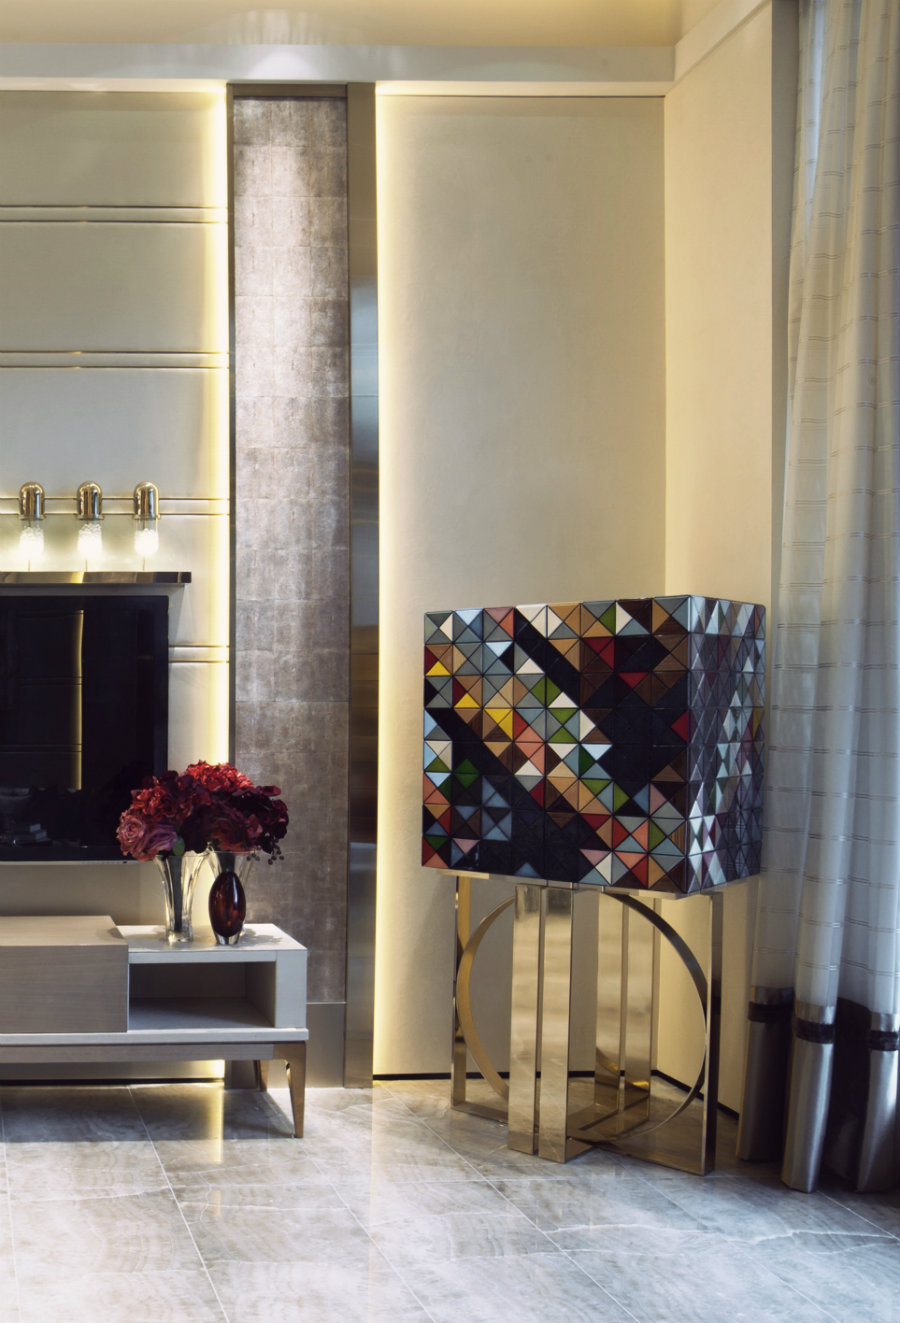 Luxury home bar furniture ideas by Boca do Lobo